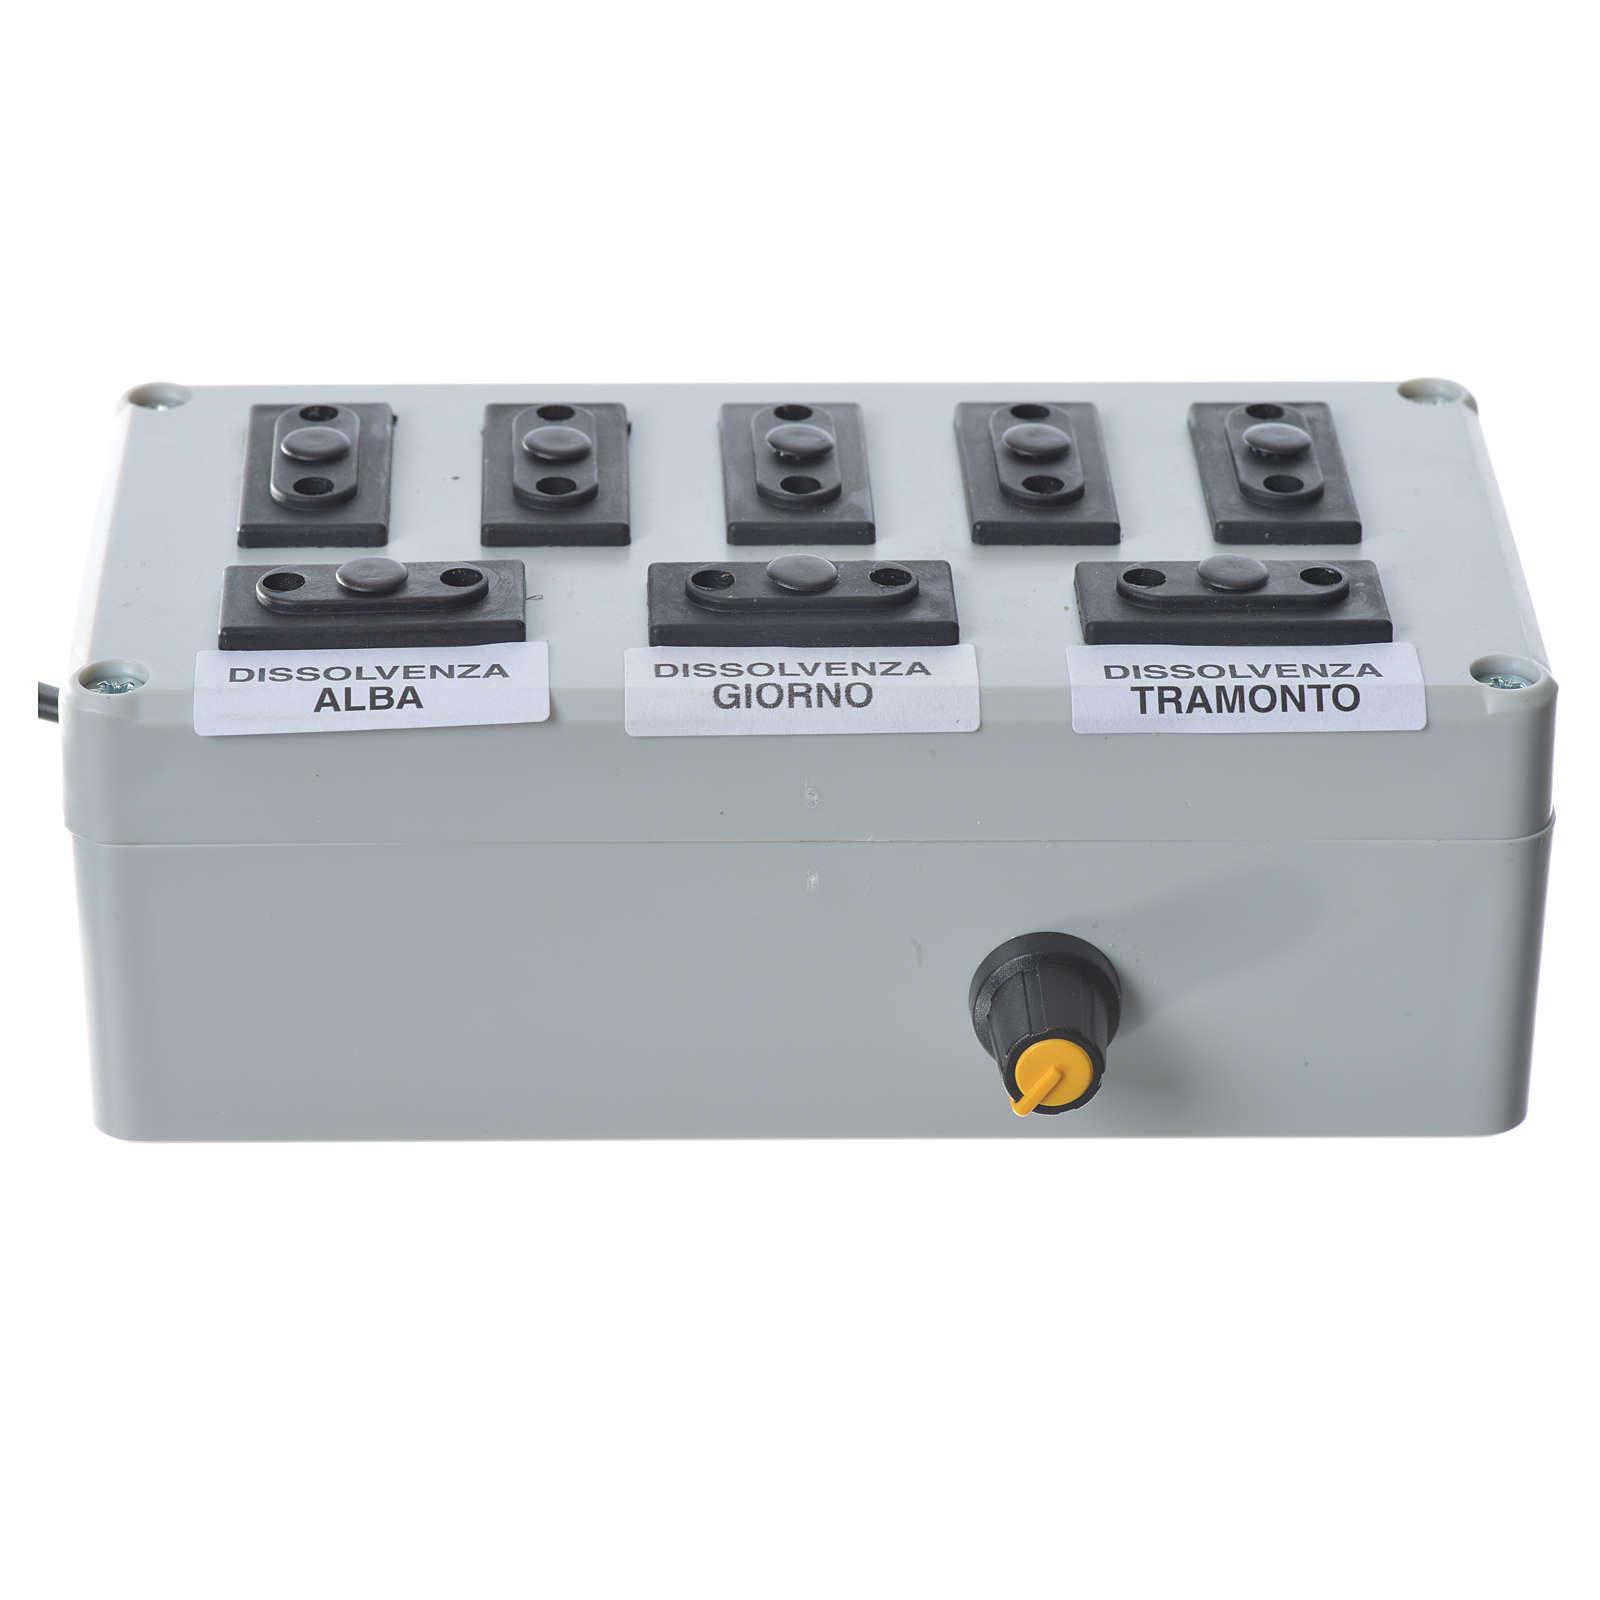 Controlador belén 1000 W 4+4 fases 4